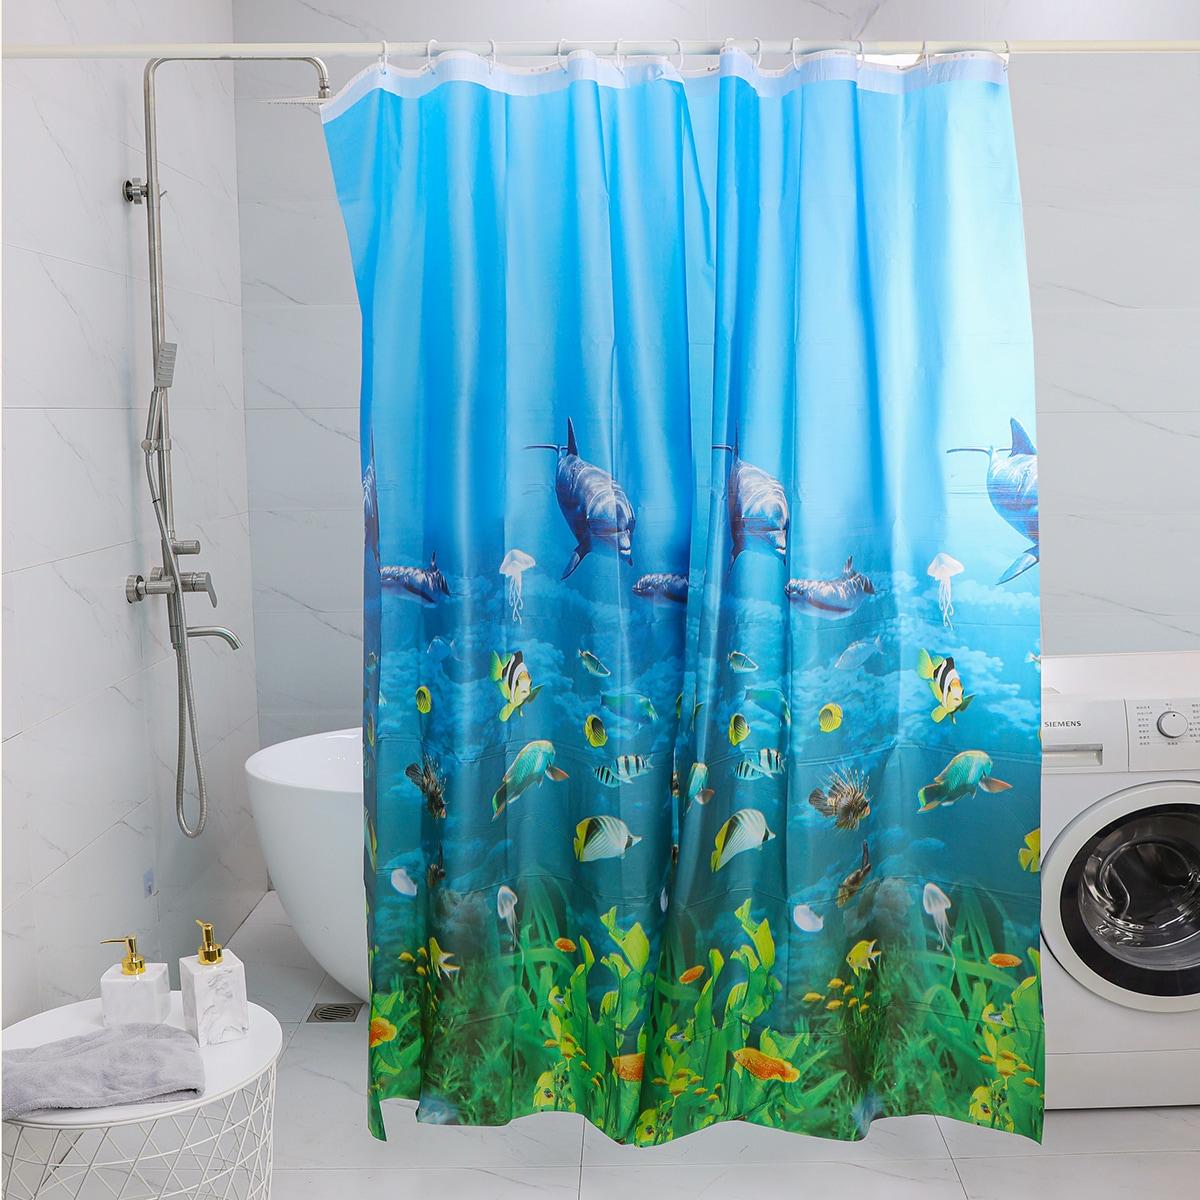 Marine Life Pattern Shower Curtain